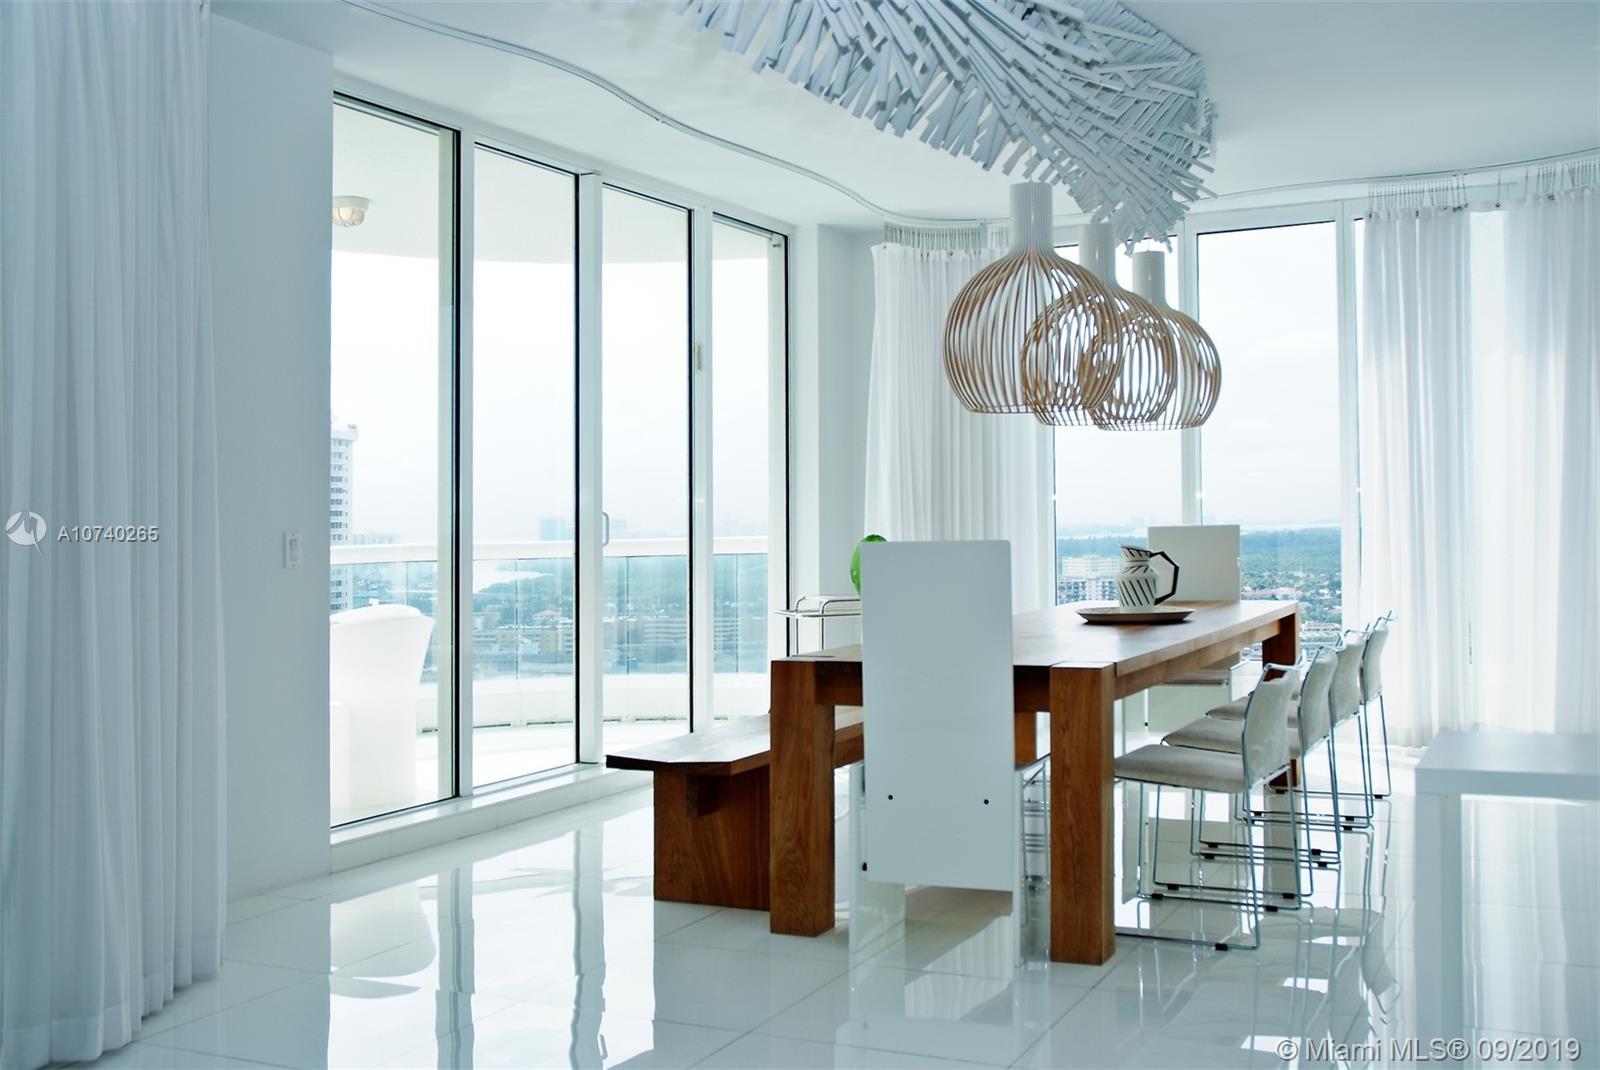 Аренда квартиры по адресу 6000 Island Bl, Aventura, FL 33160 в США